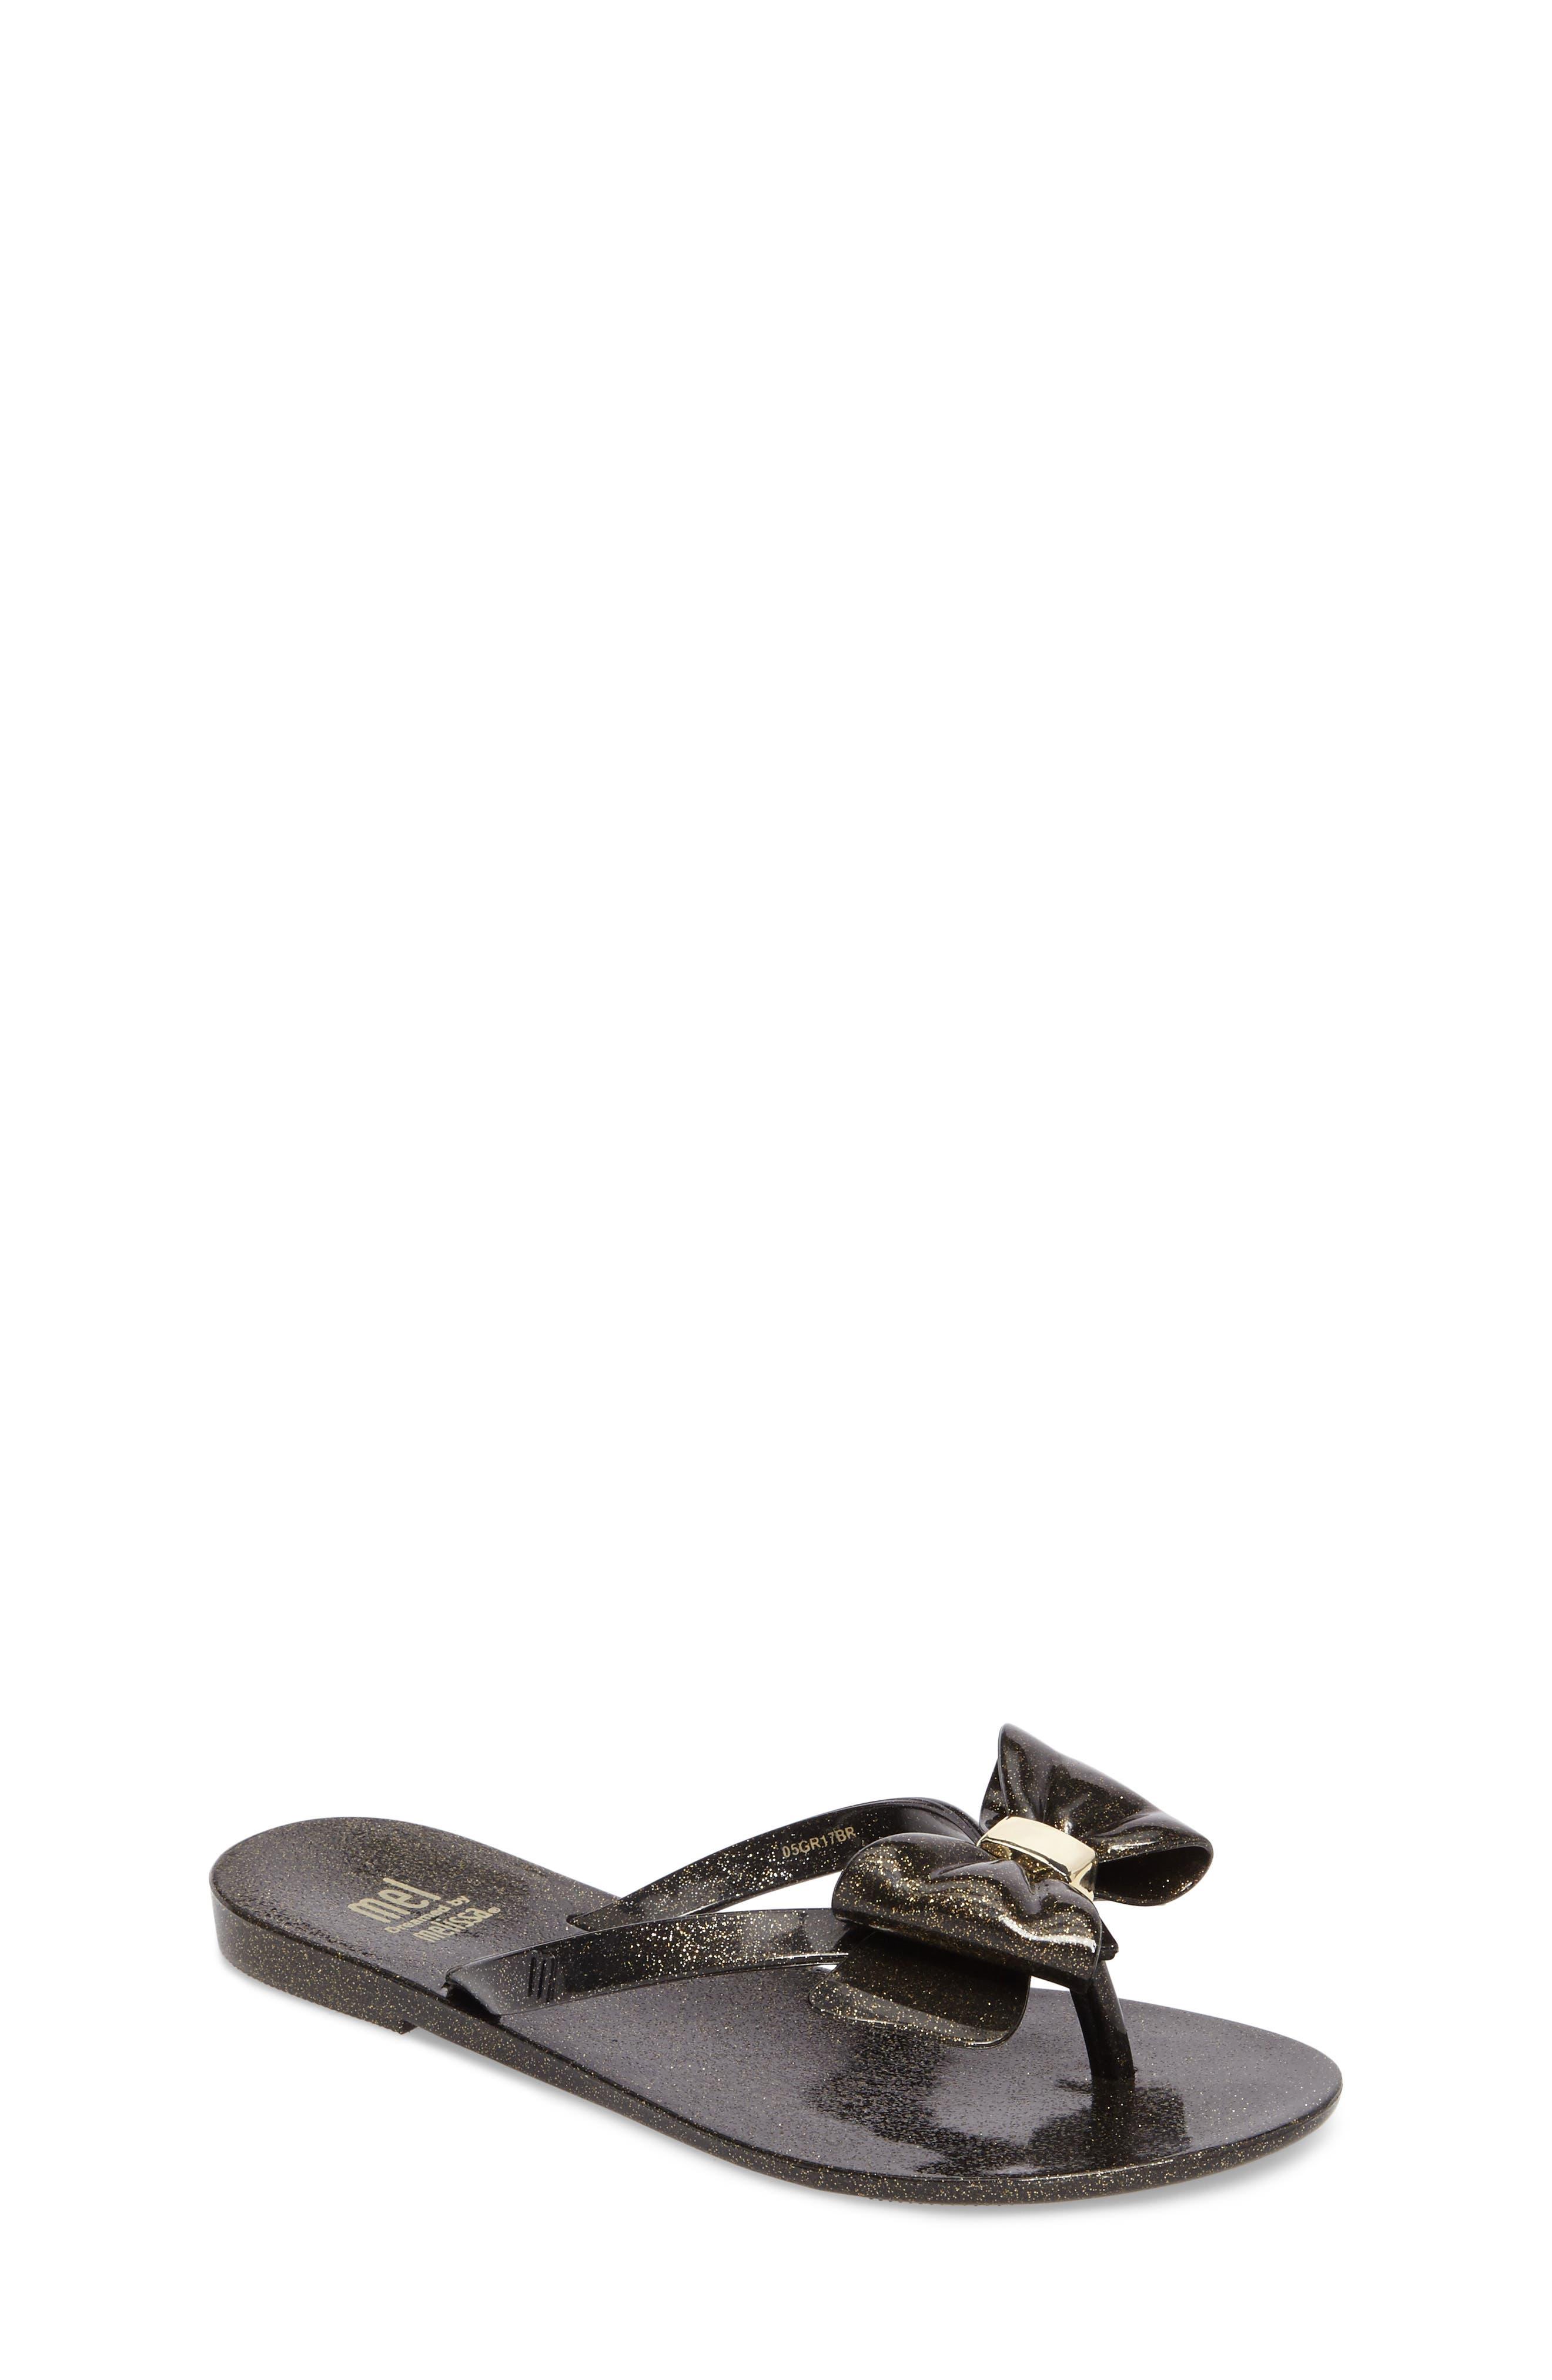 Harmonic Bow III Sandal,                         Main,                         color, 015